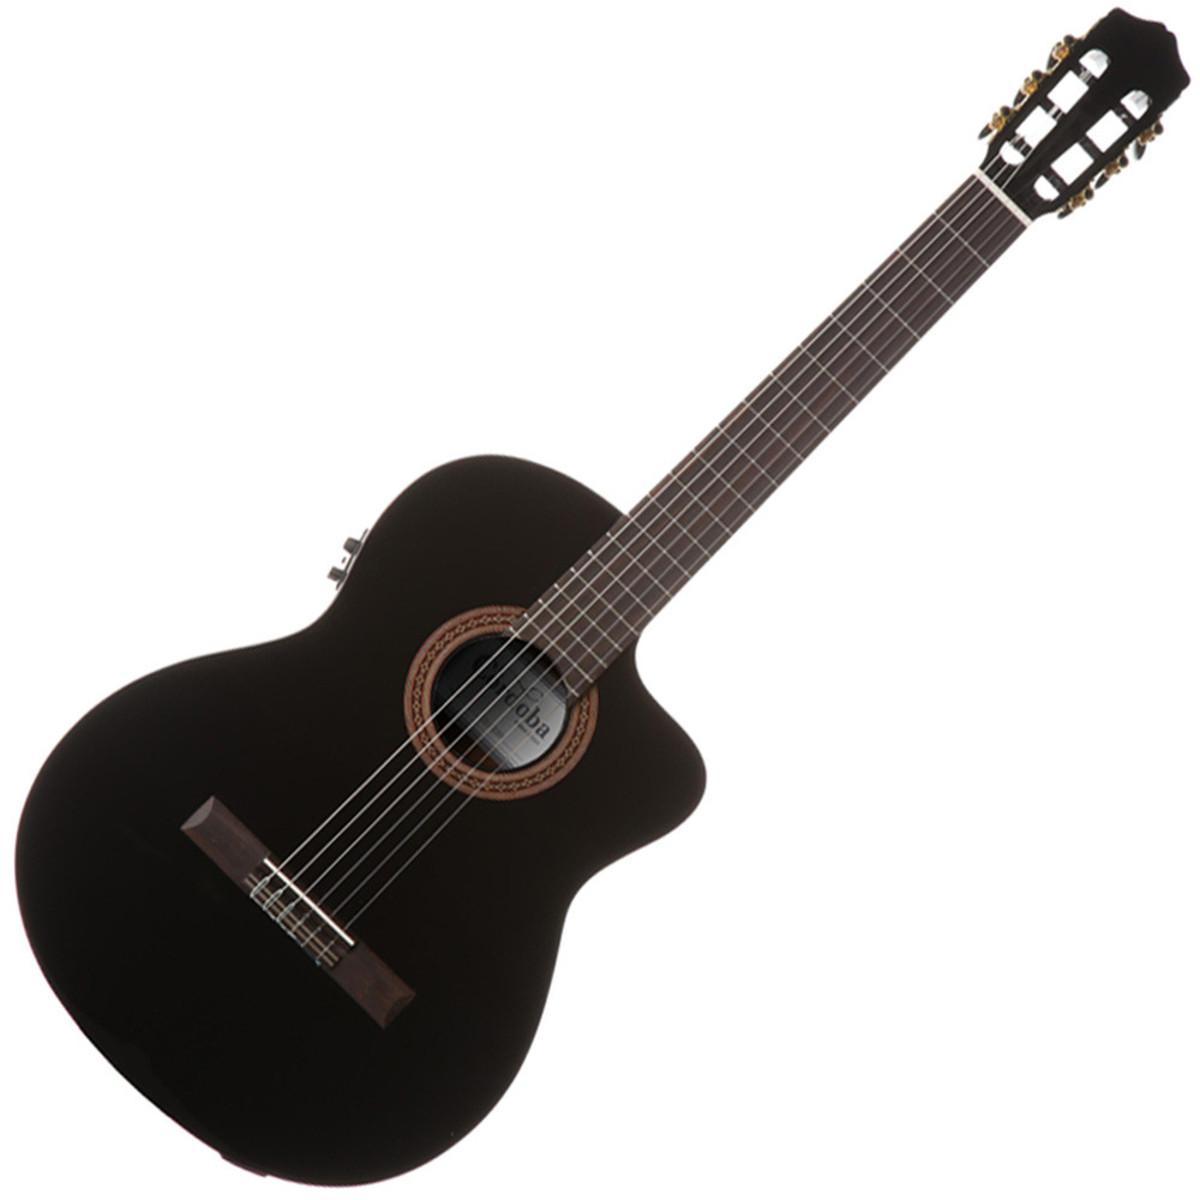 cordoba iberia c5 cebk classique electro acoustique guitare noir de jais b stock. Black Bedroom Furniture Sets. Home Design Ideas